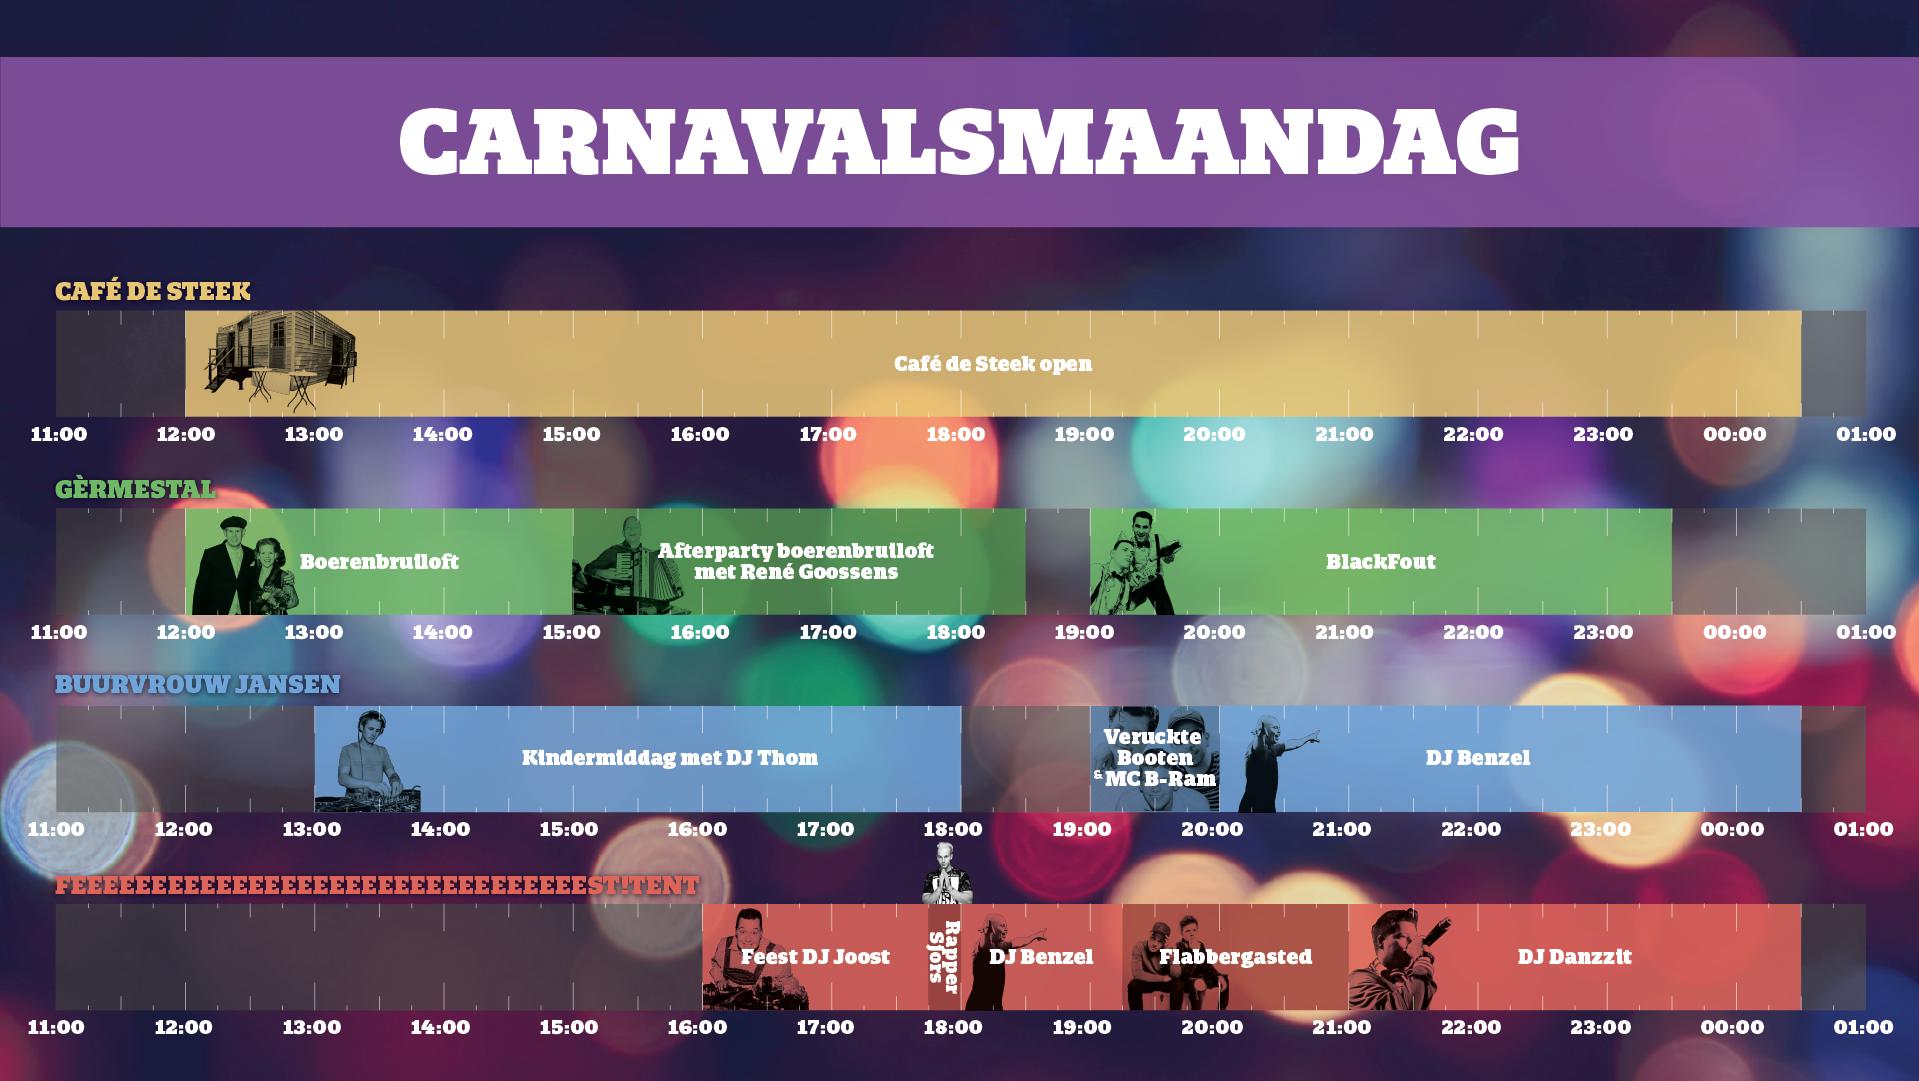 carnaval mill timetable programma overzicht maandag